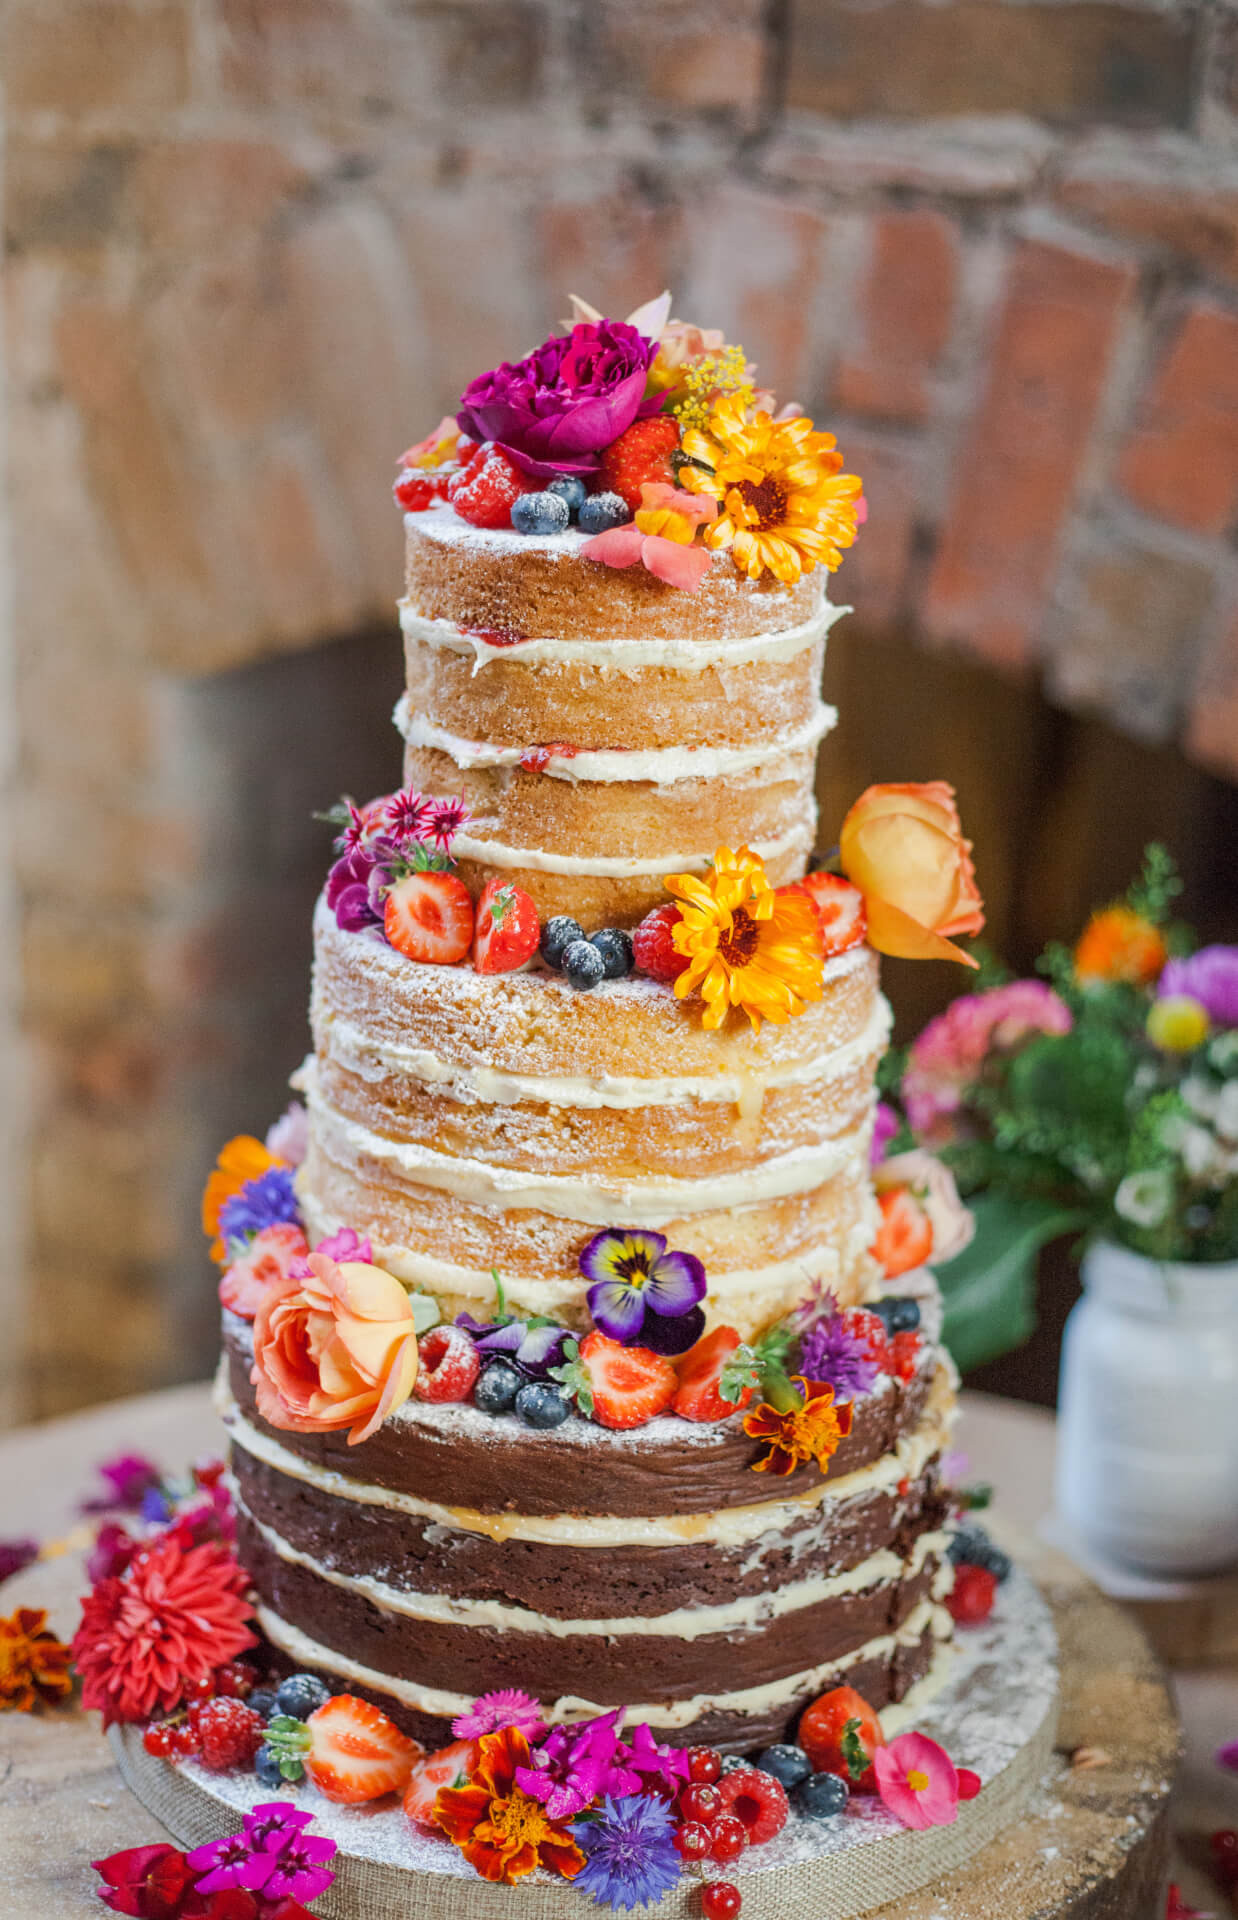 Naked Wedding Cake Recipe  Edible Flowers for Naked Wedding Cakes Fresh Edible